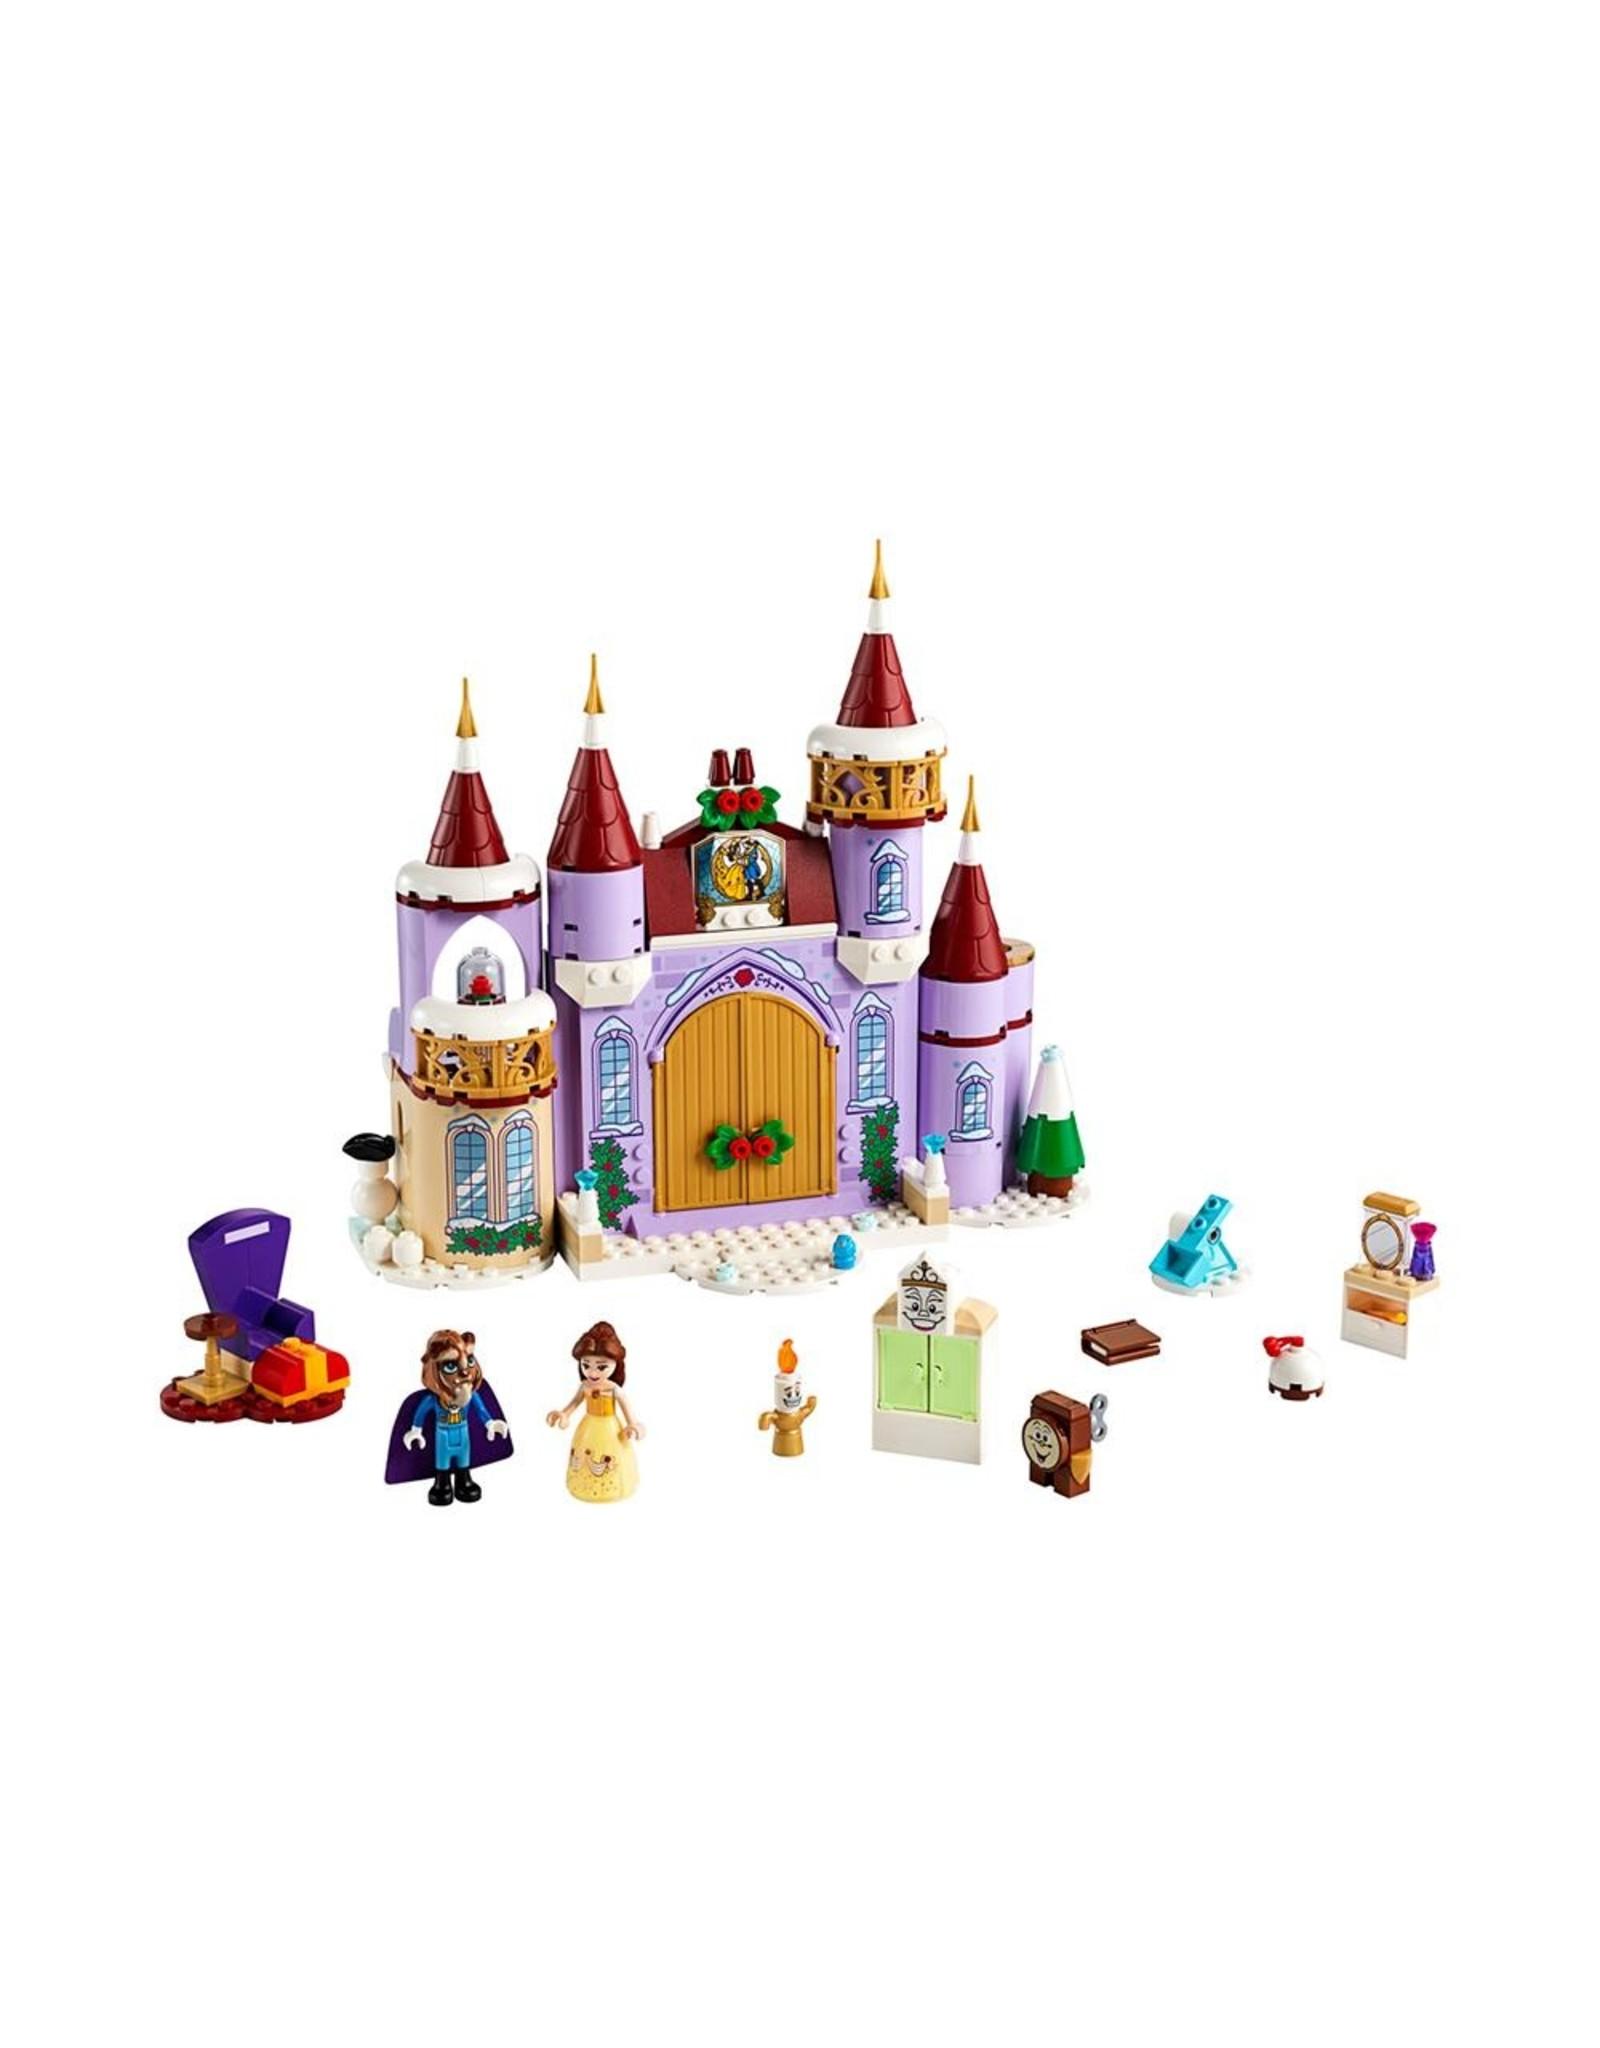 LEGO Disney Princess - 43180 - Belle's Castle Winter Celebration